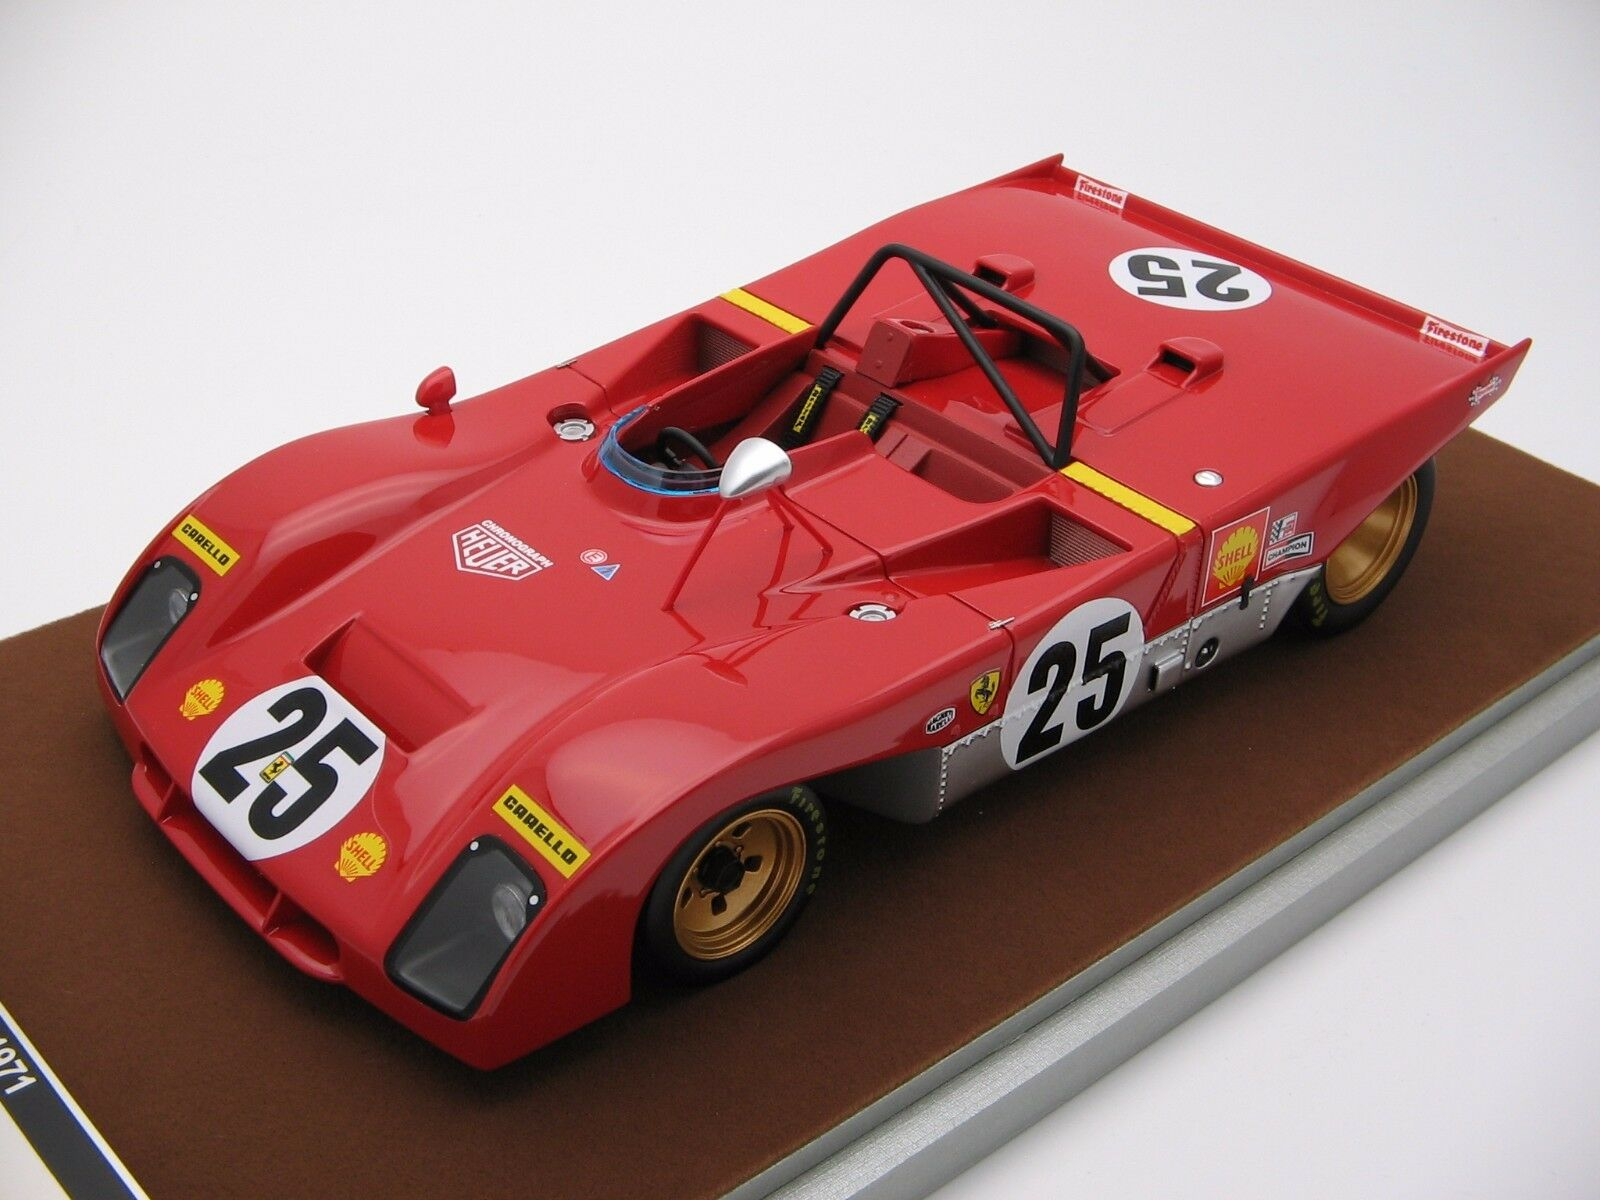 precios ultra bajos 1 18 scale Tecnomodel Ferrari 312PB 312PB 312PB Sebring 12h 1971 TM18-61D  hermoso